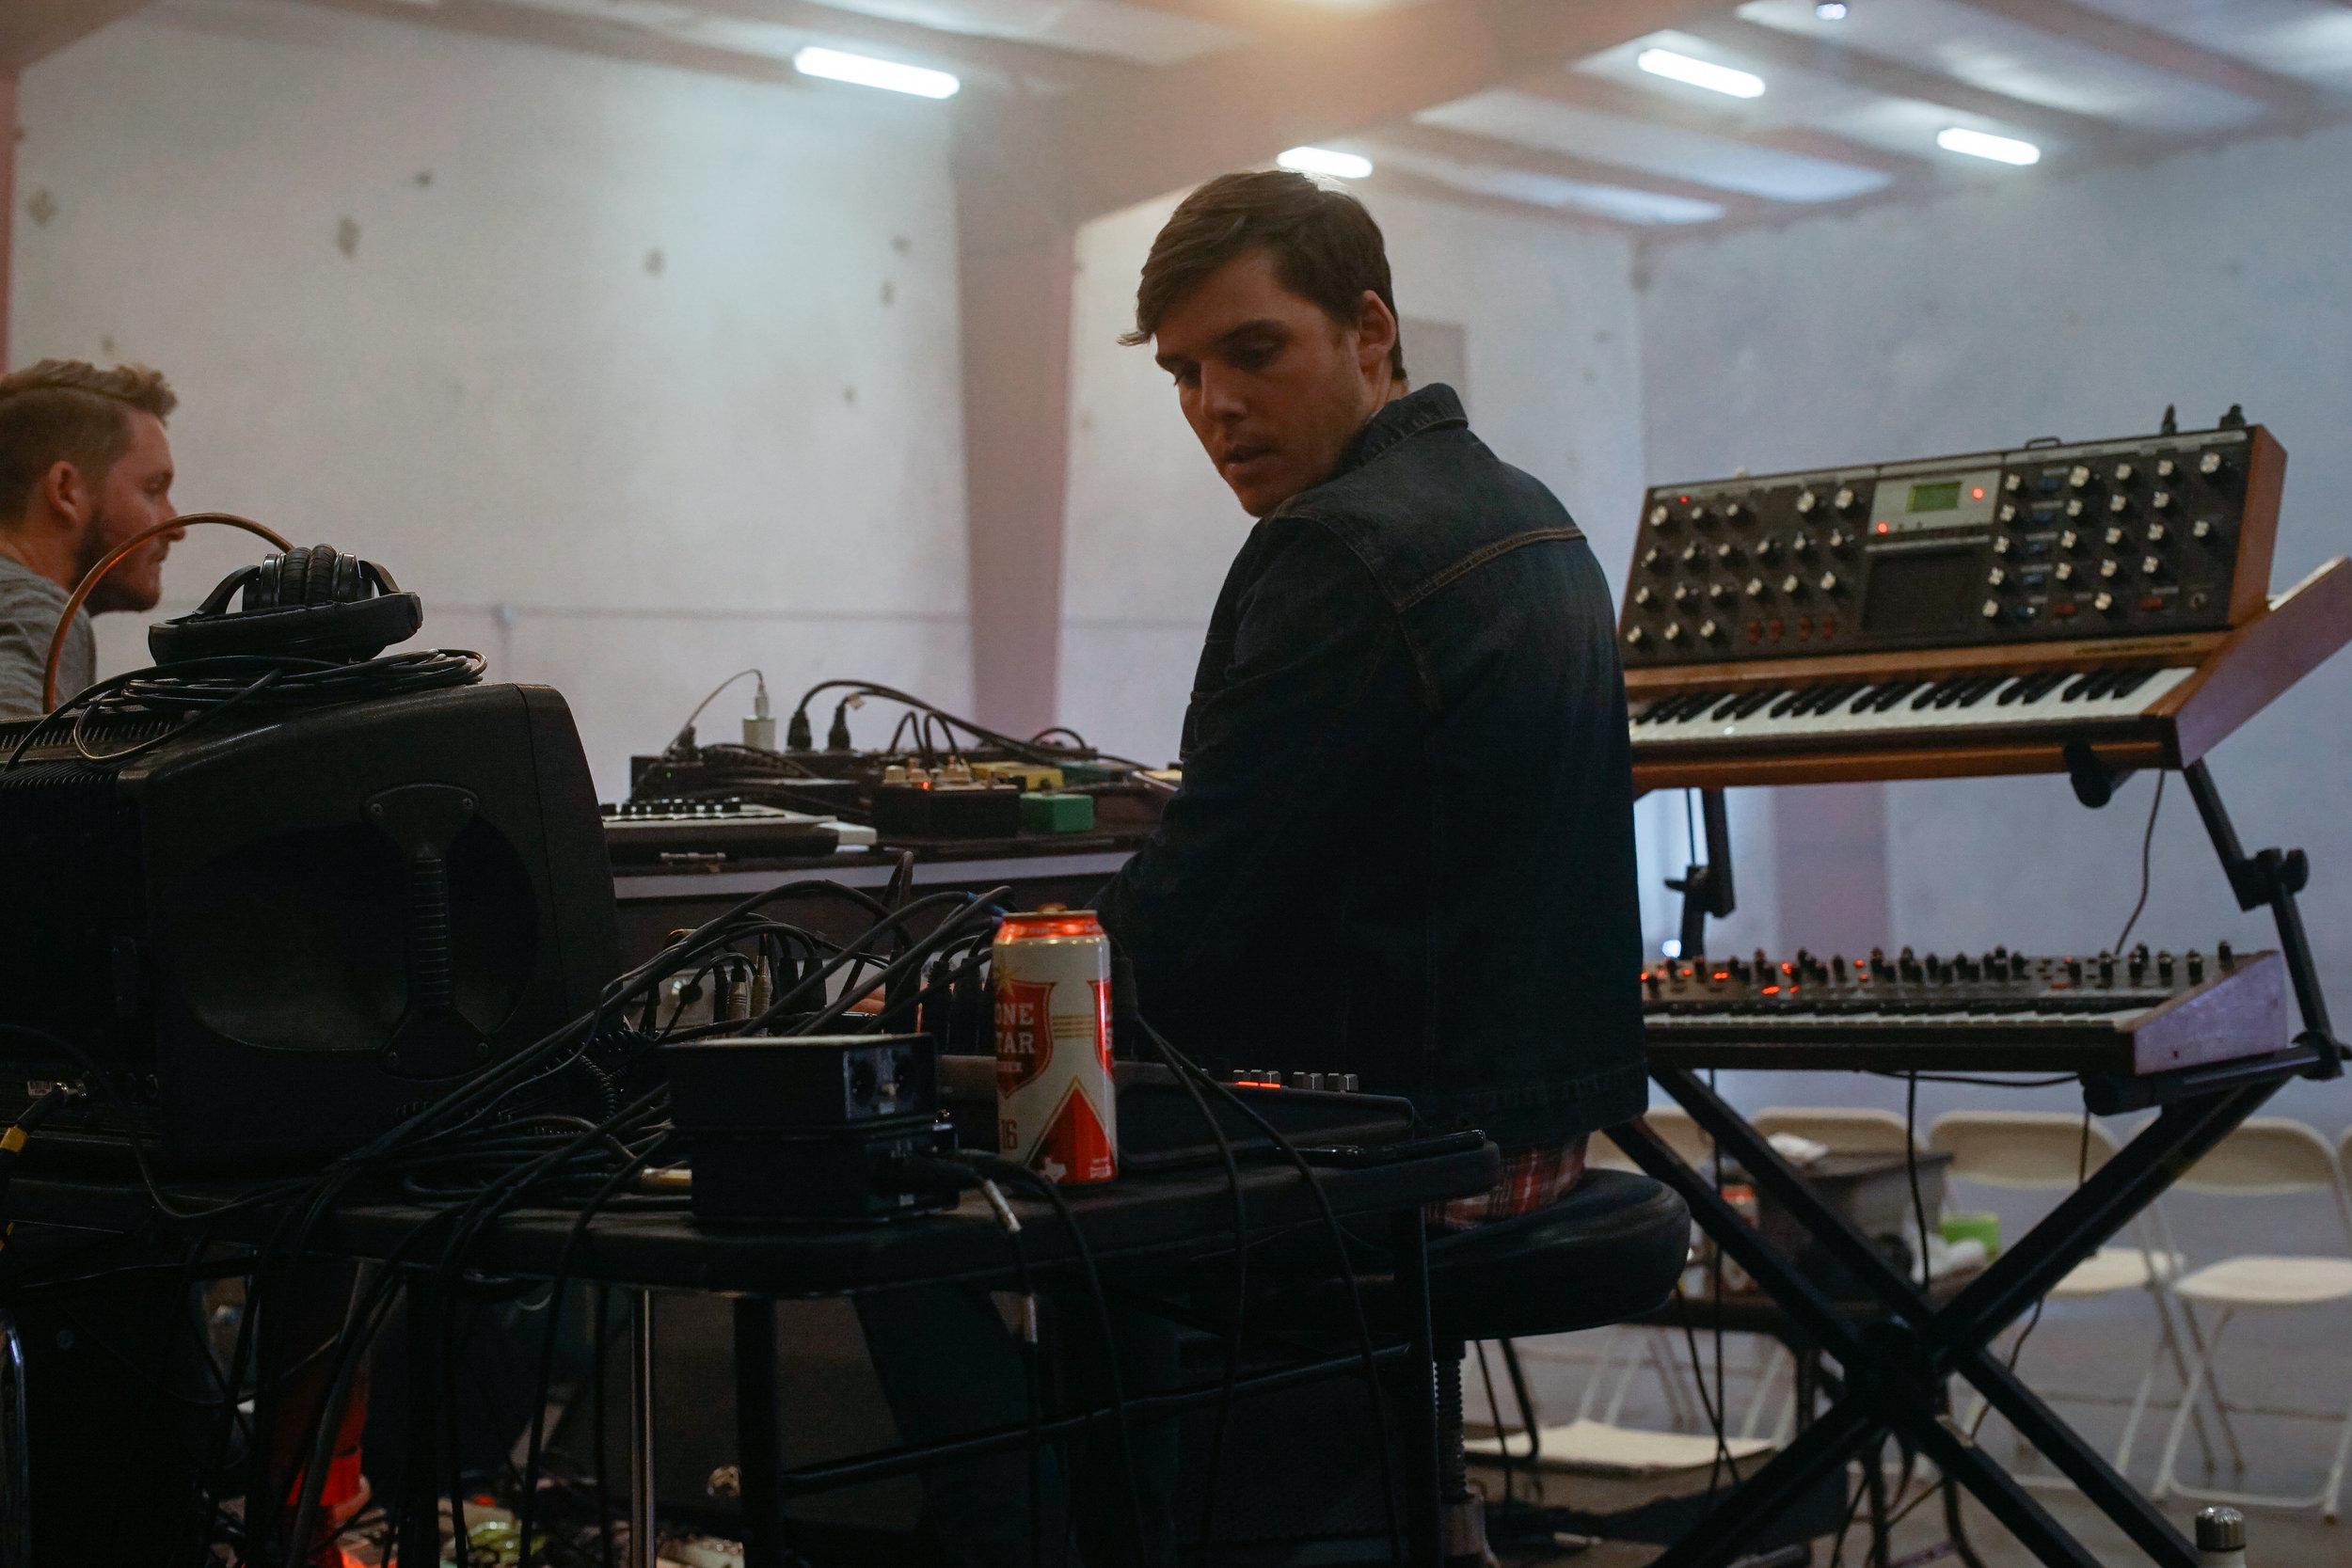 Musician/Composer: Michael Brown